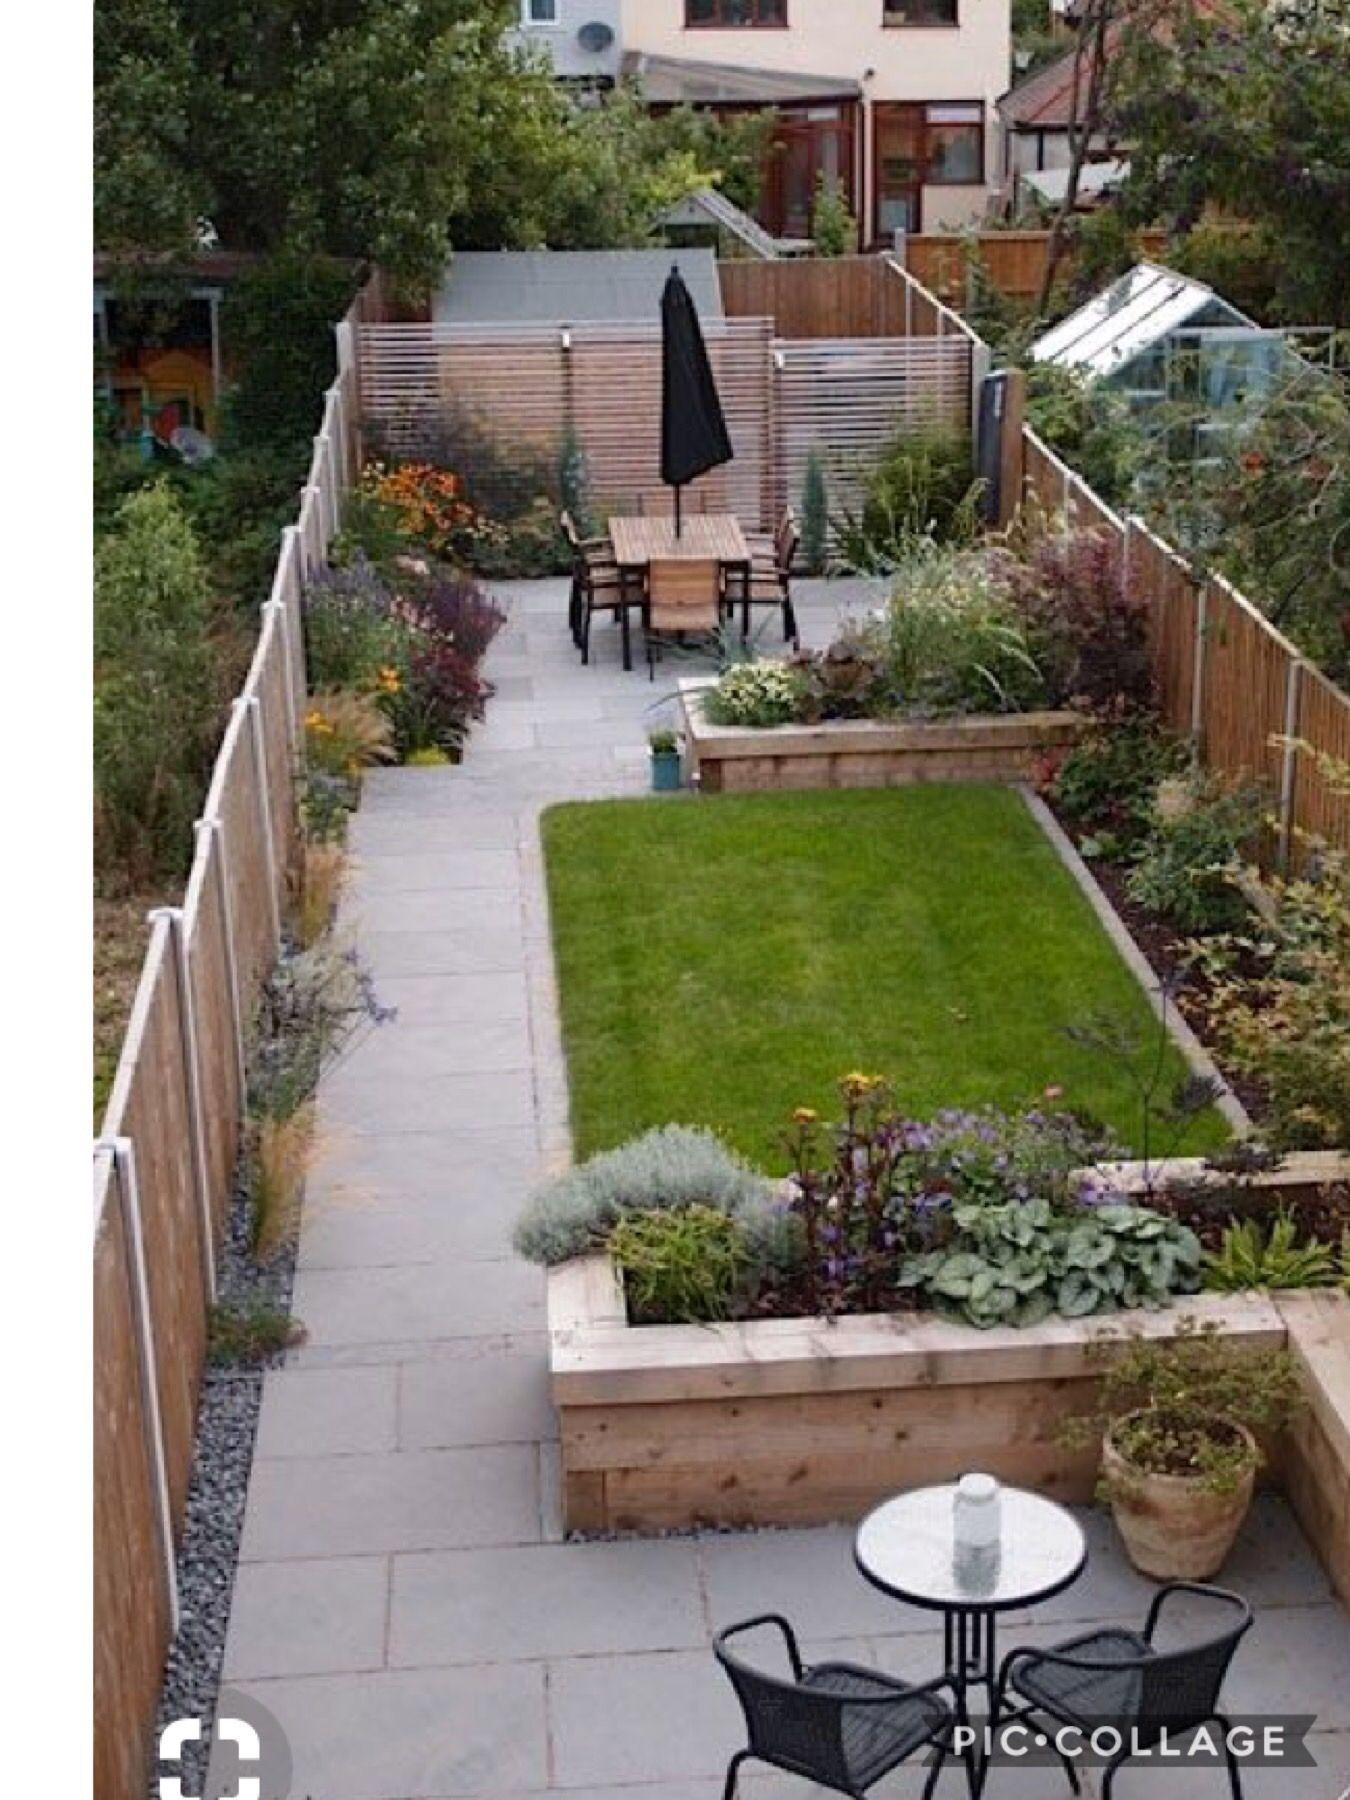 fenced townhouse hard idea | Rainy Daze | Pinterest | Garden ideas ...